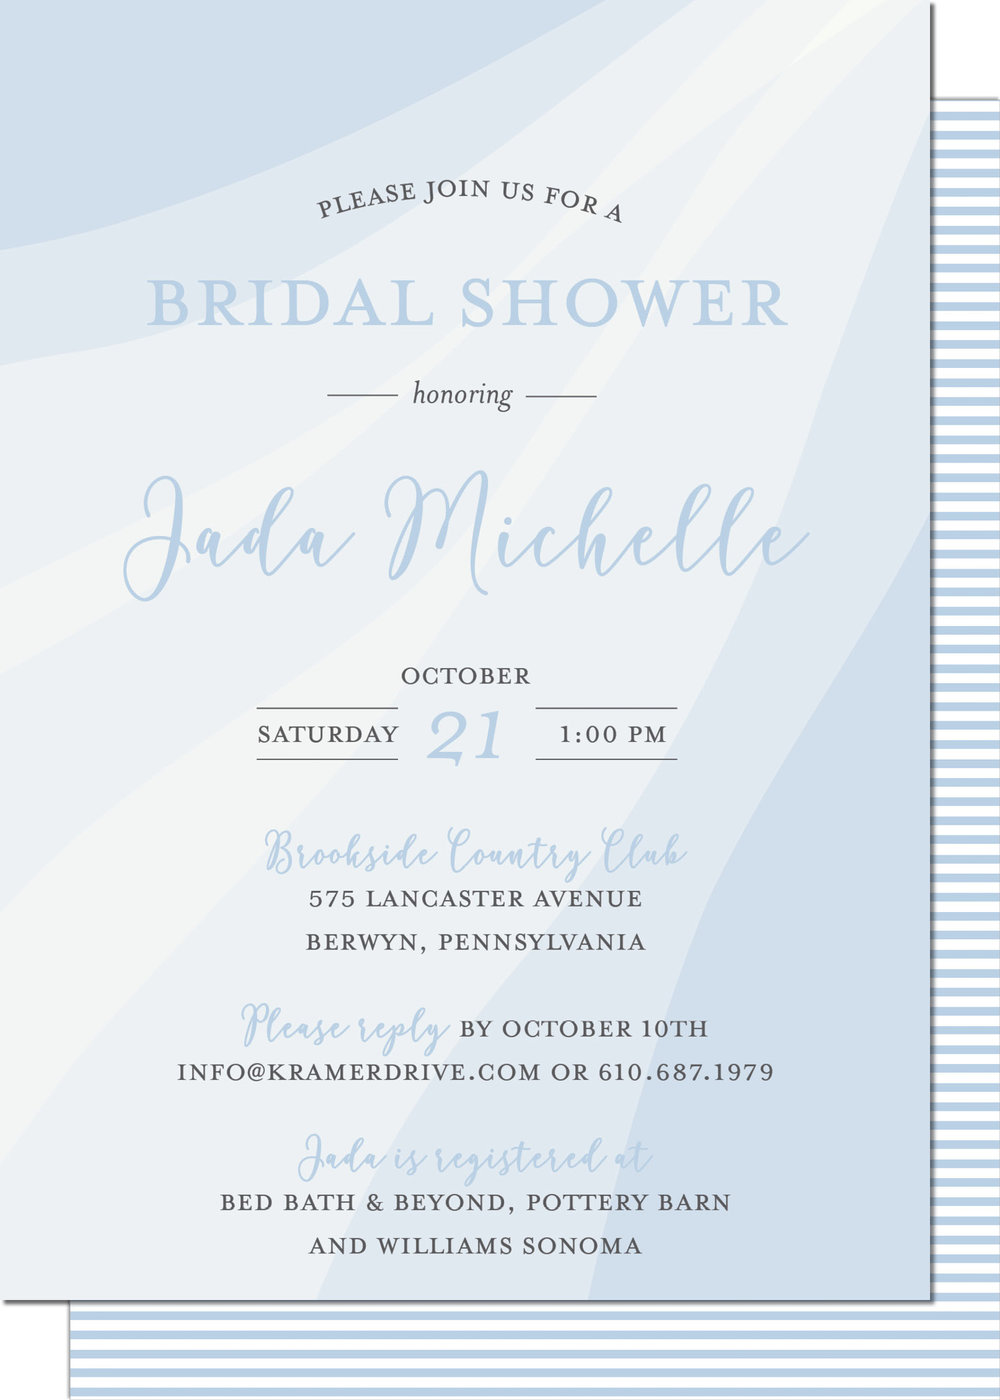 KD2179IN-PB Bridal Veil